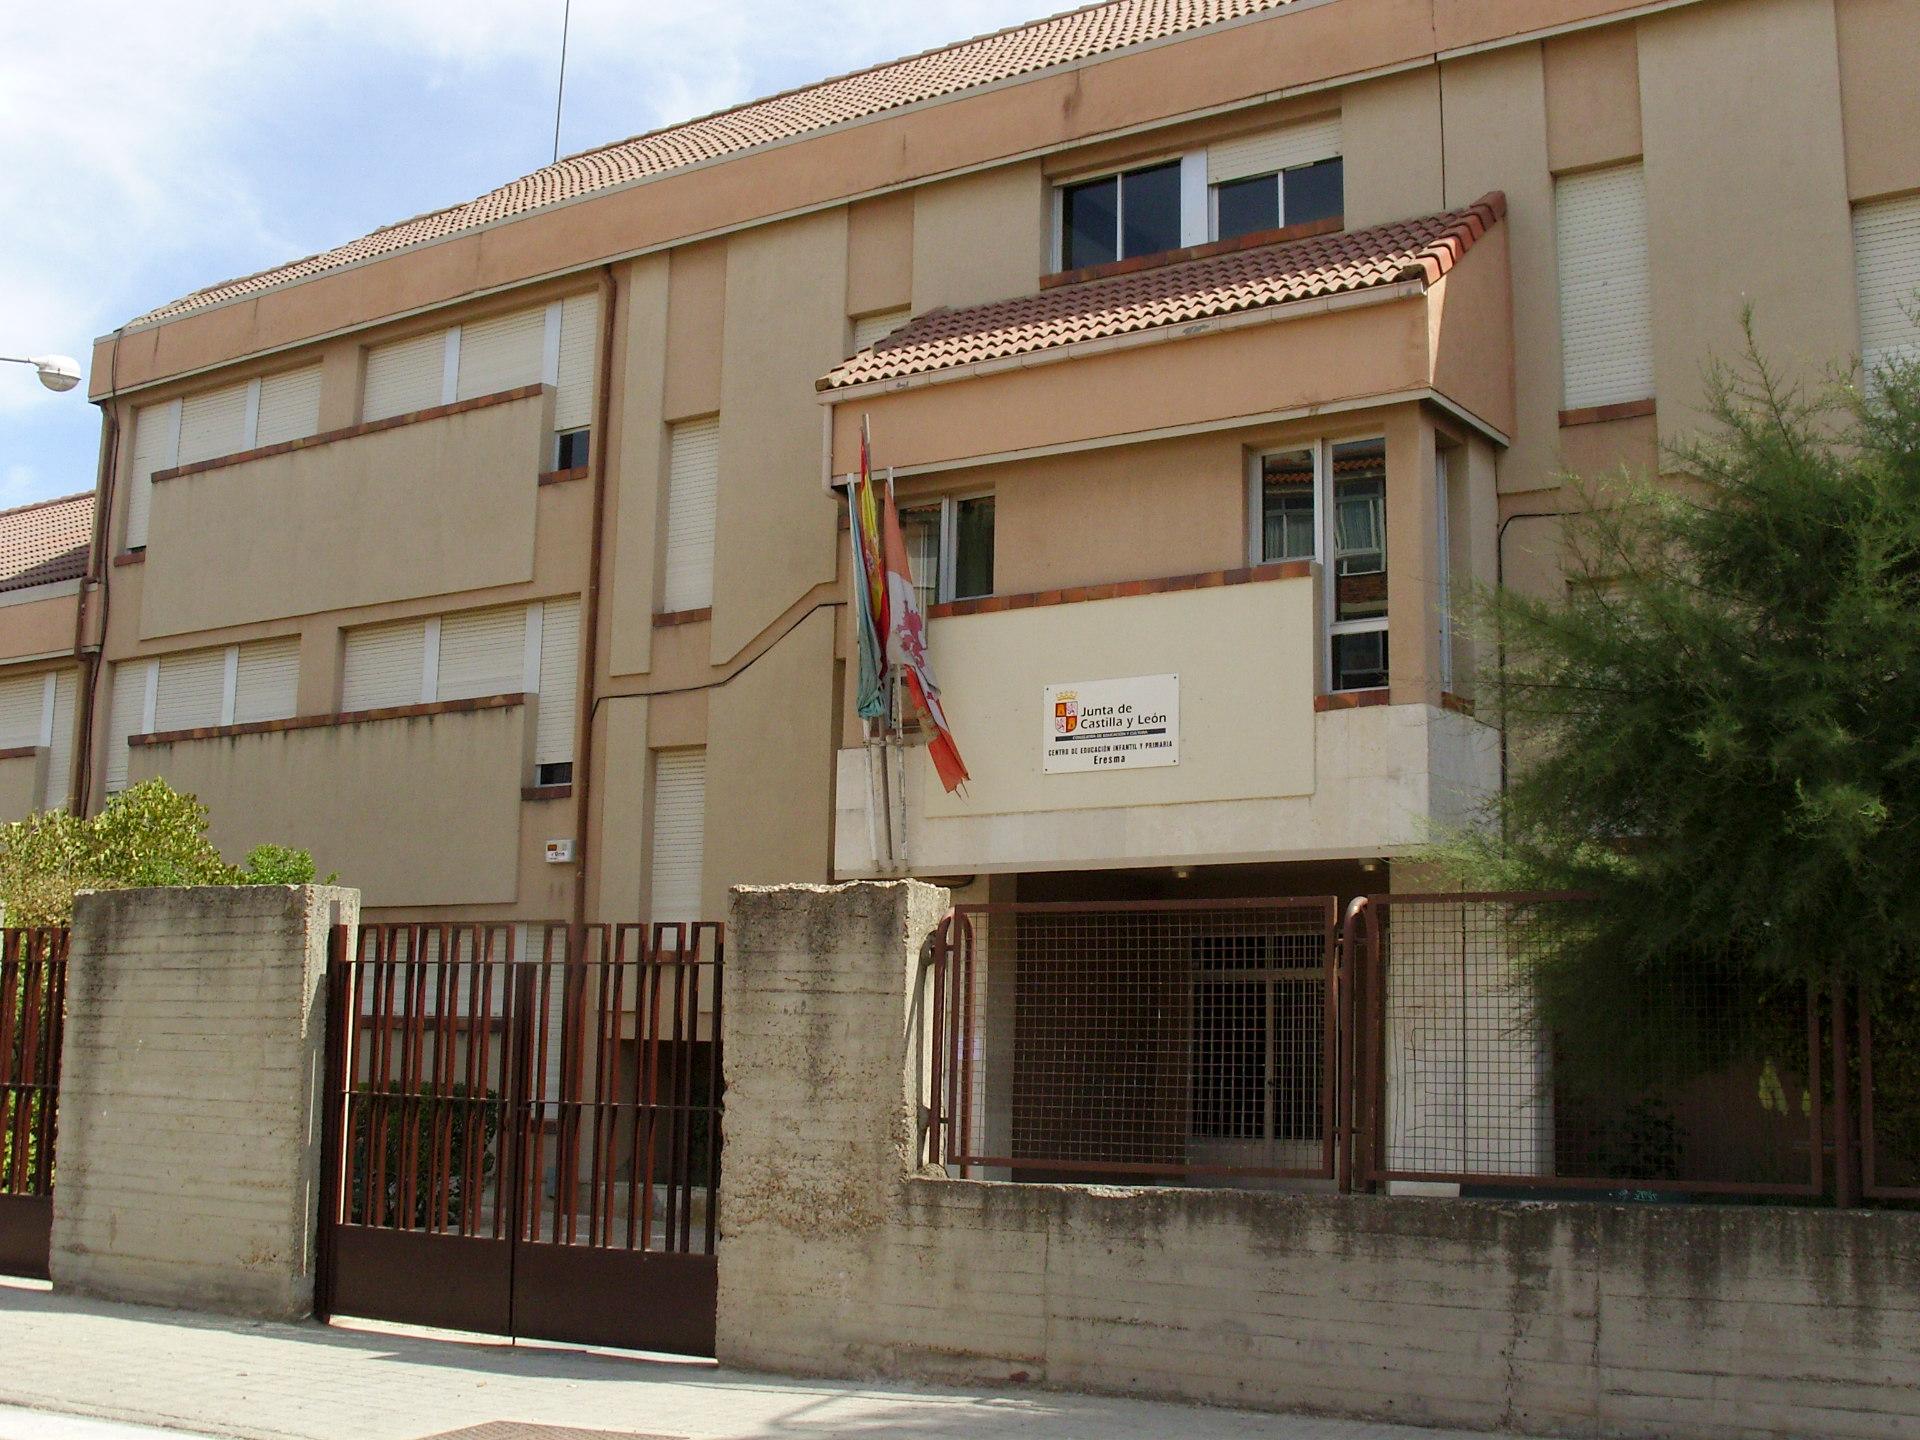 Colegio Público Eresma